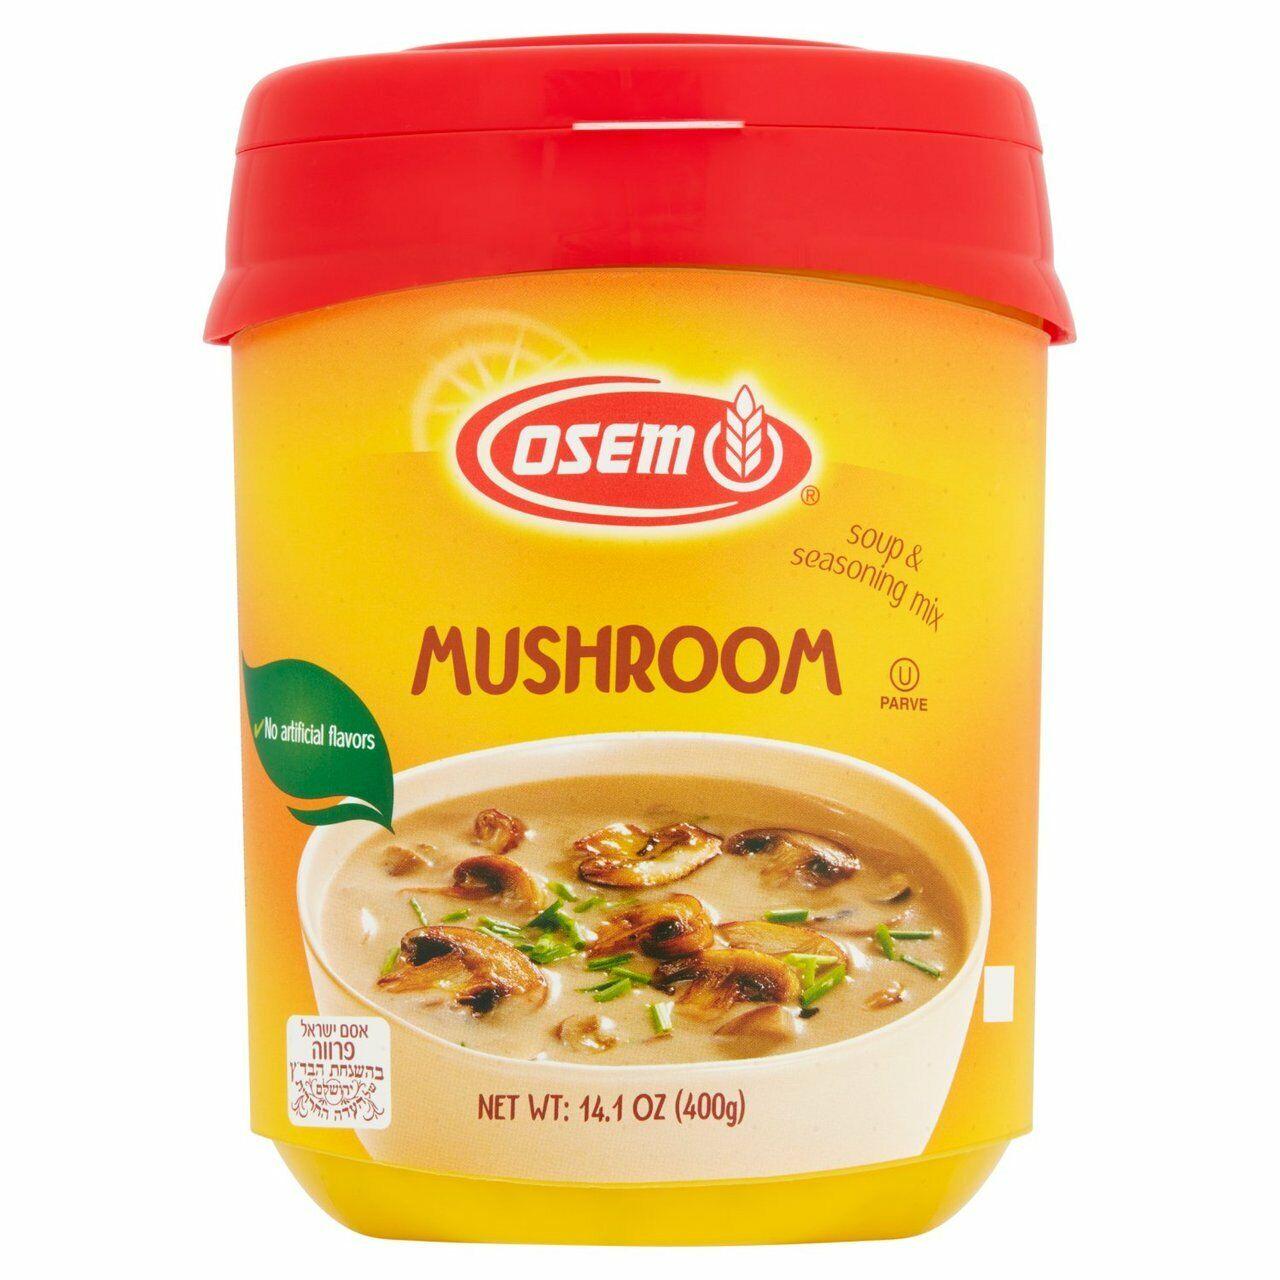 Osem Fungo Zuppa E Stagionatura Mix 400g 398ml Kasher